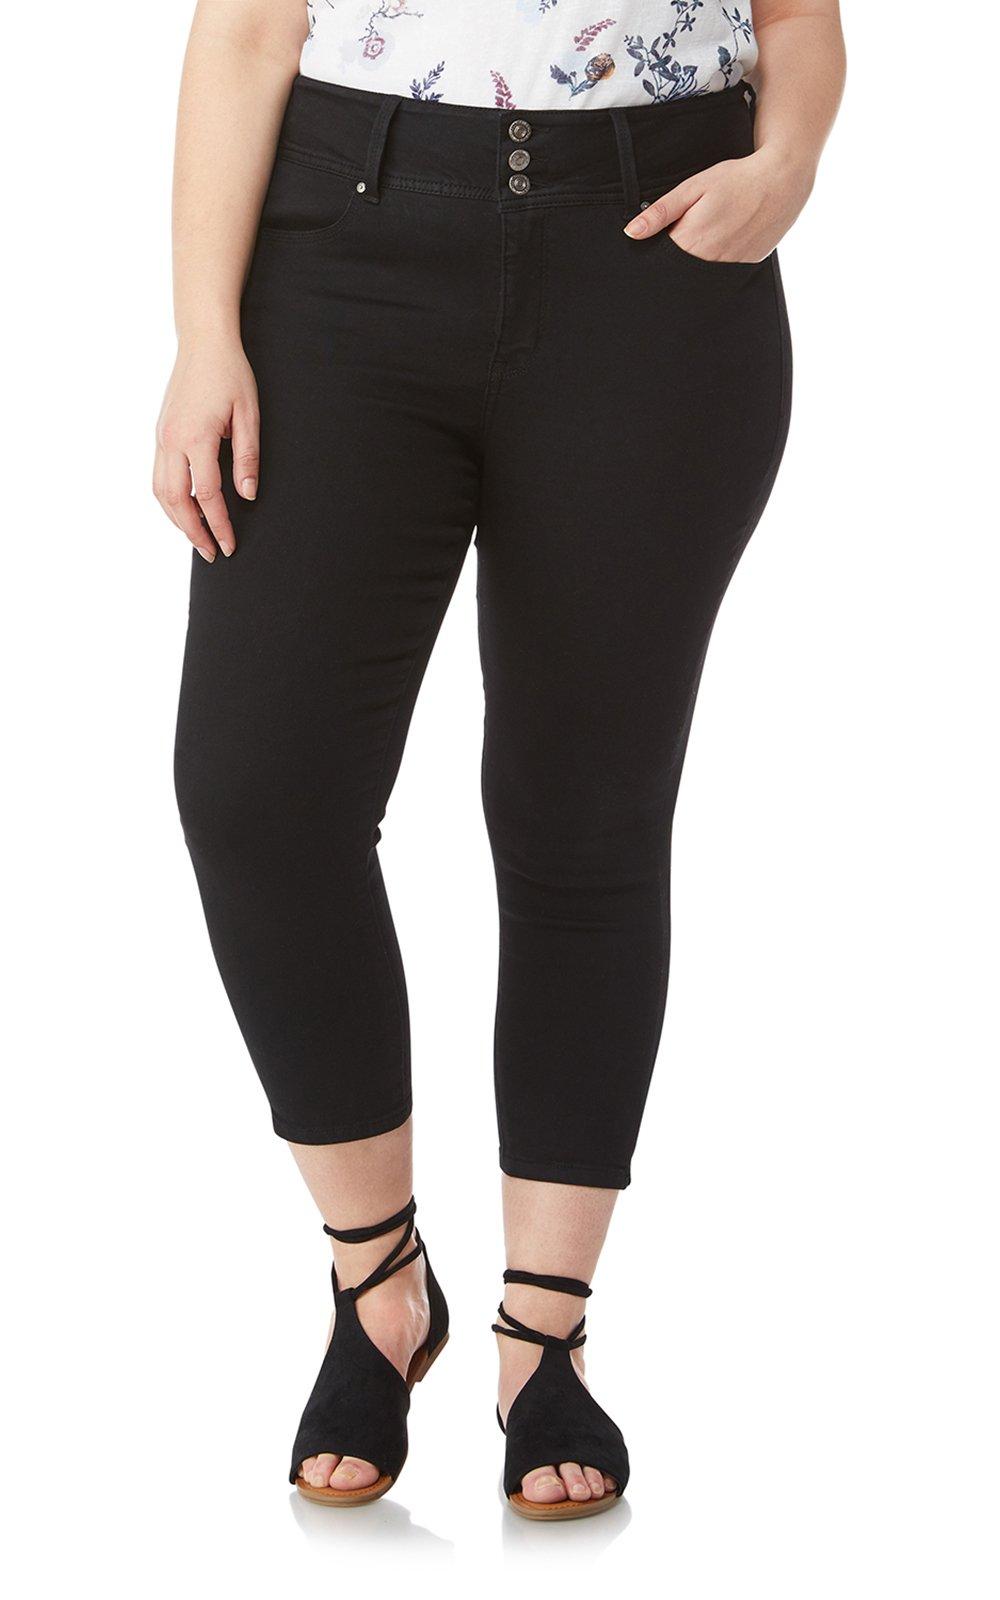 WallFlower Women's Plus Size InstaSoft Sassy Denim Capri Crop in Noir, 22 Plus